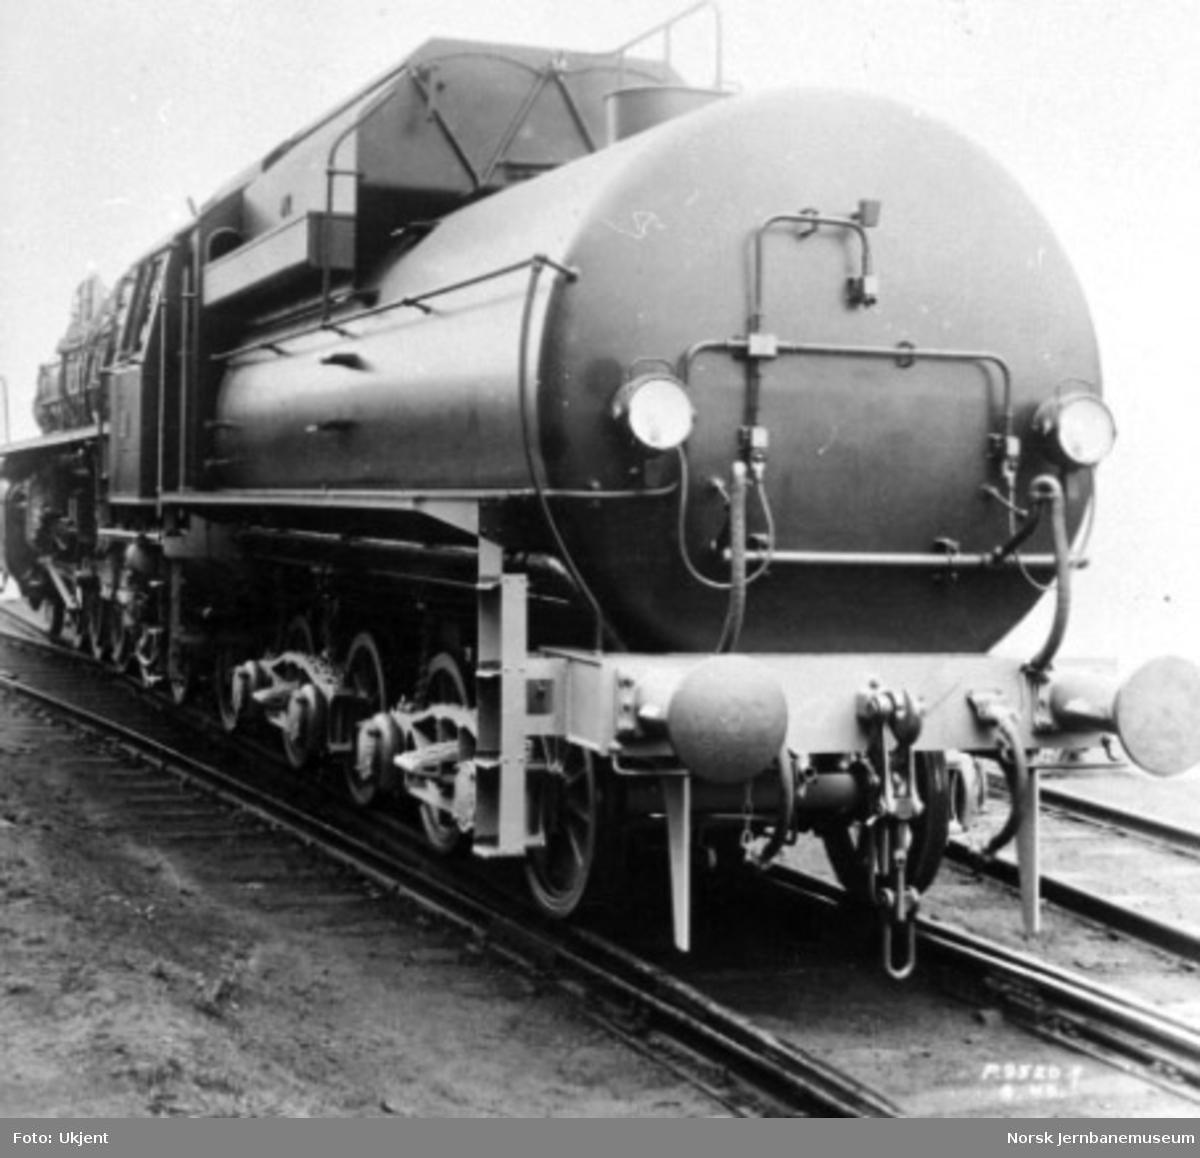 Leveransefoto av damplokomotiv type 49c nr. 471, bakfra